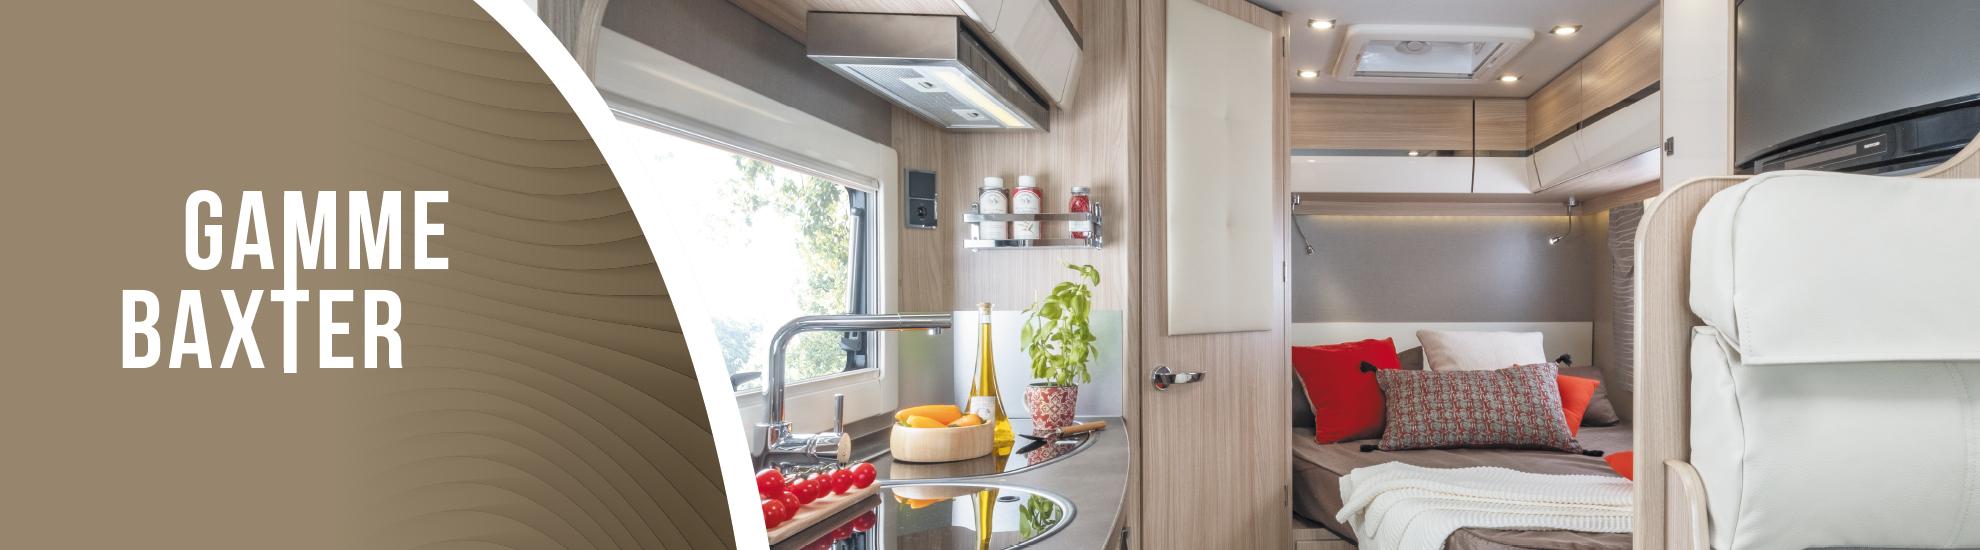 camping-car-Florium-gamme-baxter-slide